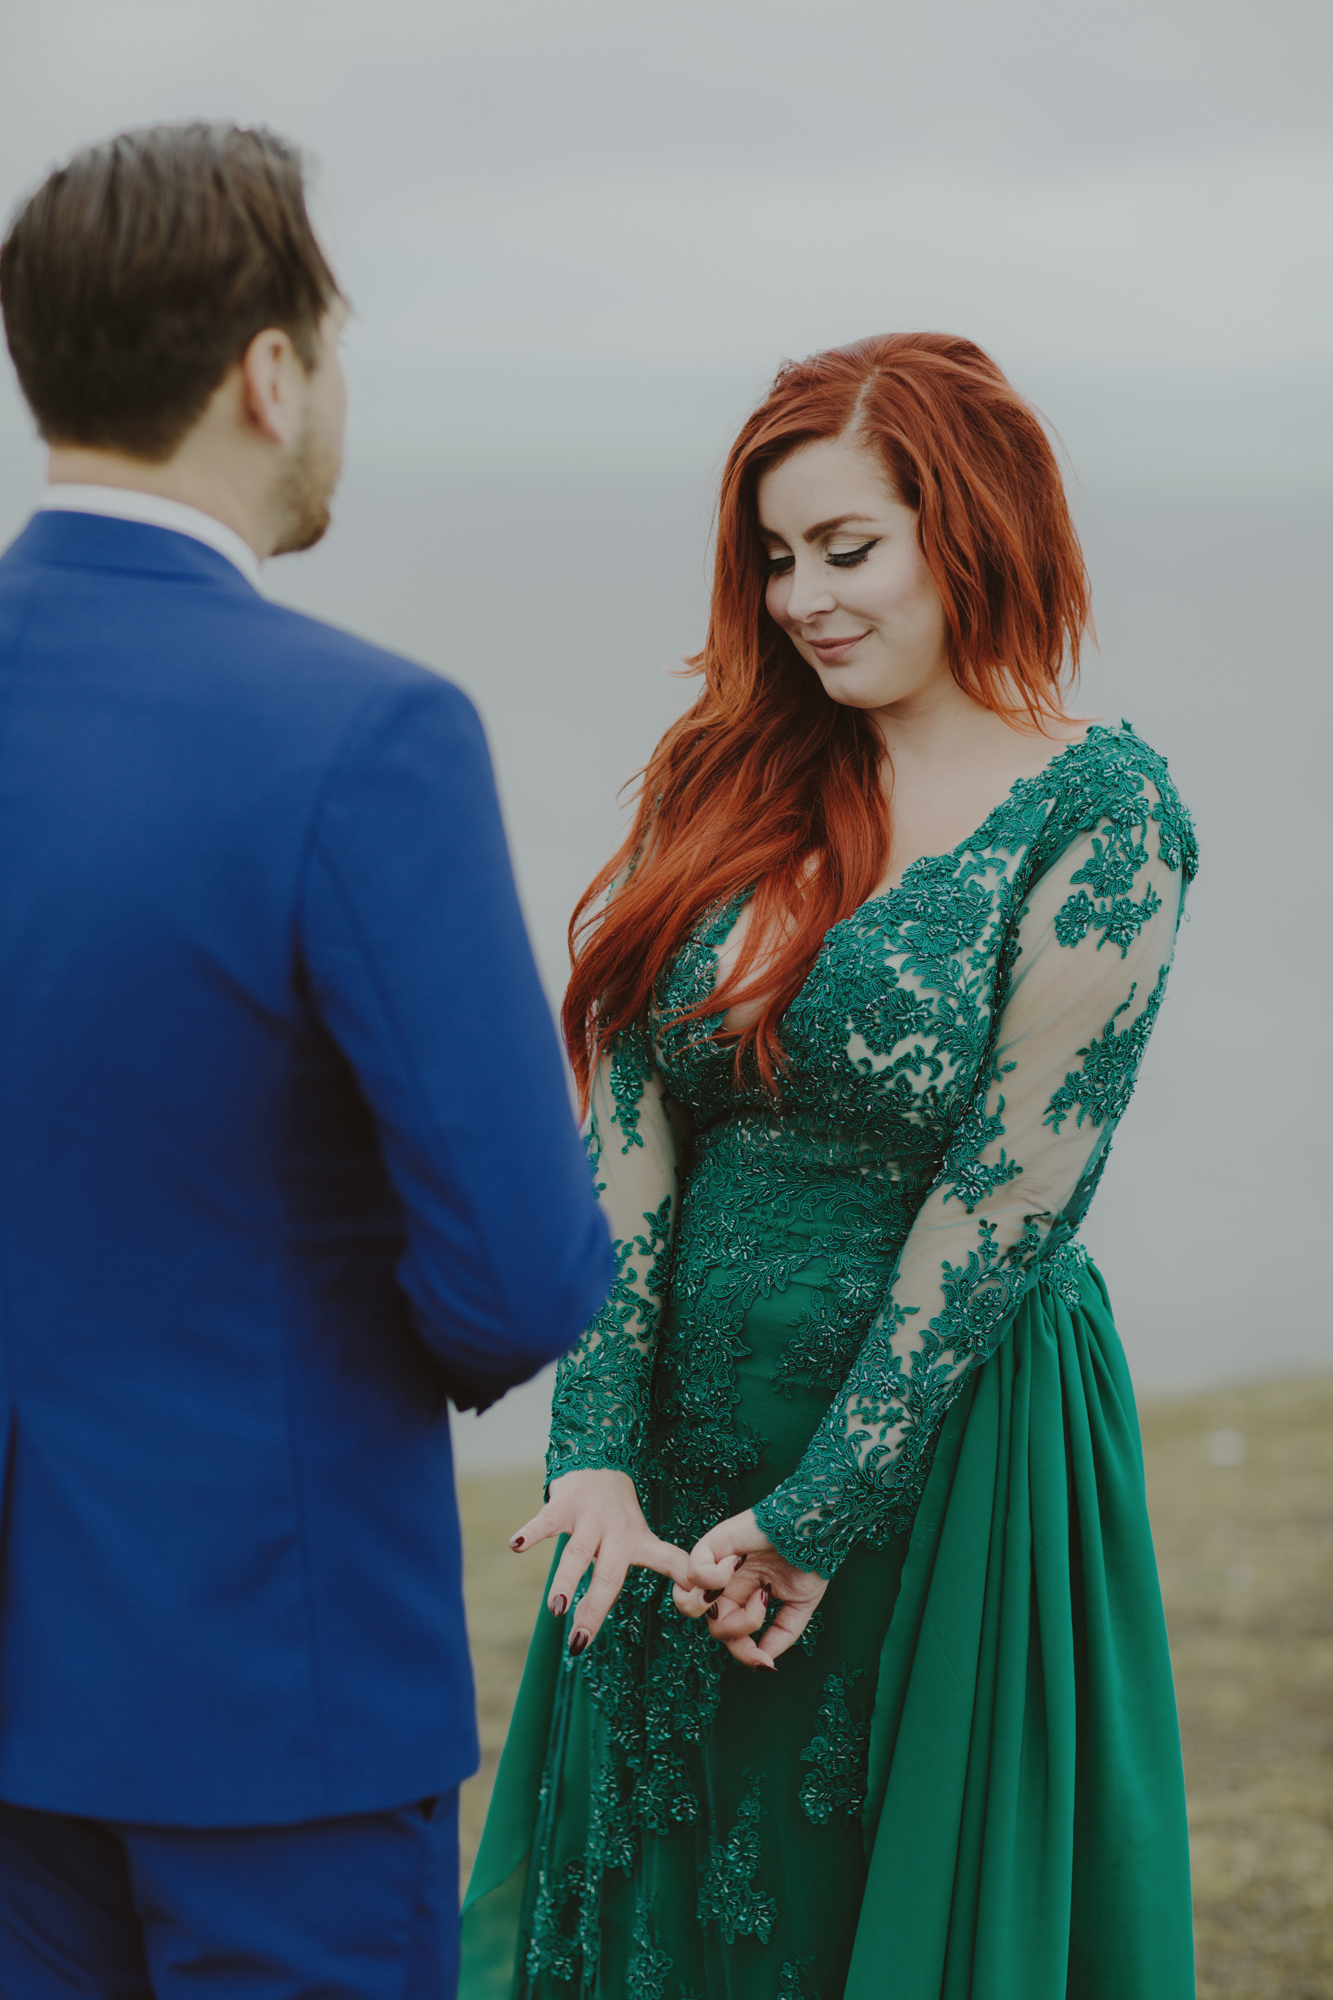 iceland_elopement_wedding_sammblake_043.jpg